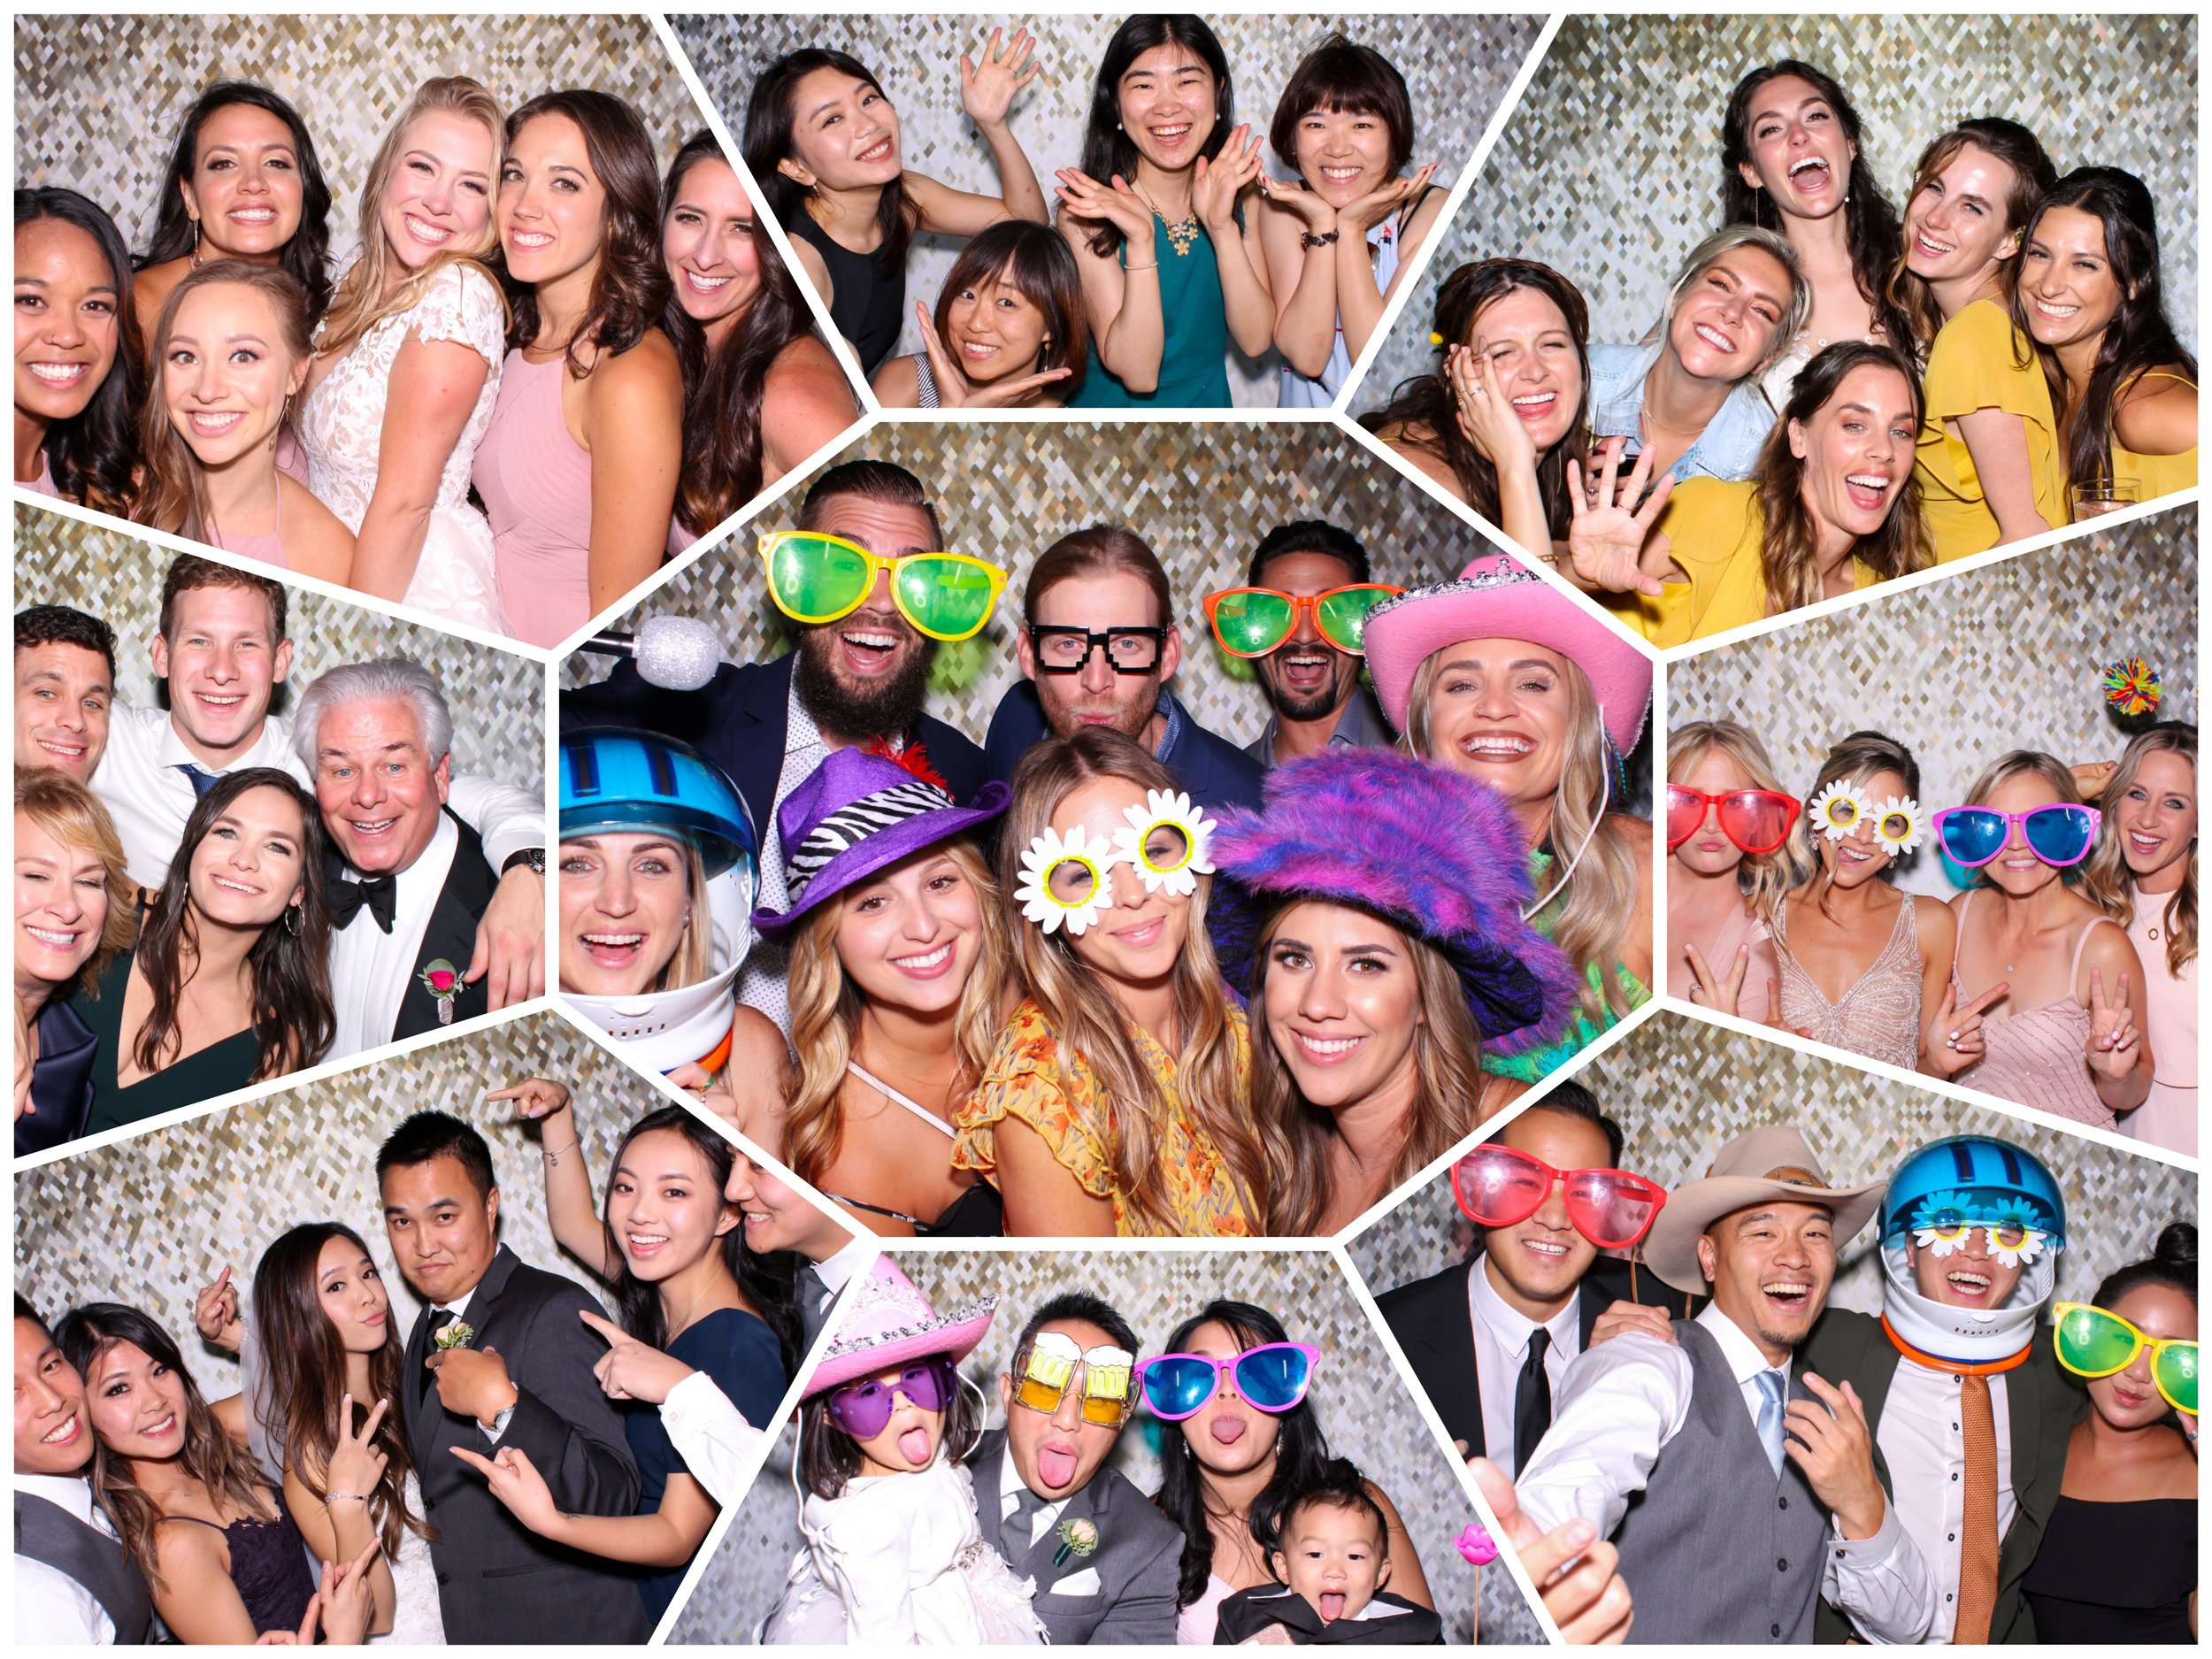 LOS GATOS DJ - Photo Booth Photos - 2018 Wedding Season copy 2.JPEG